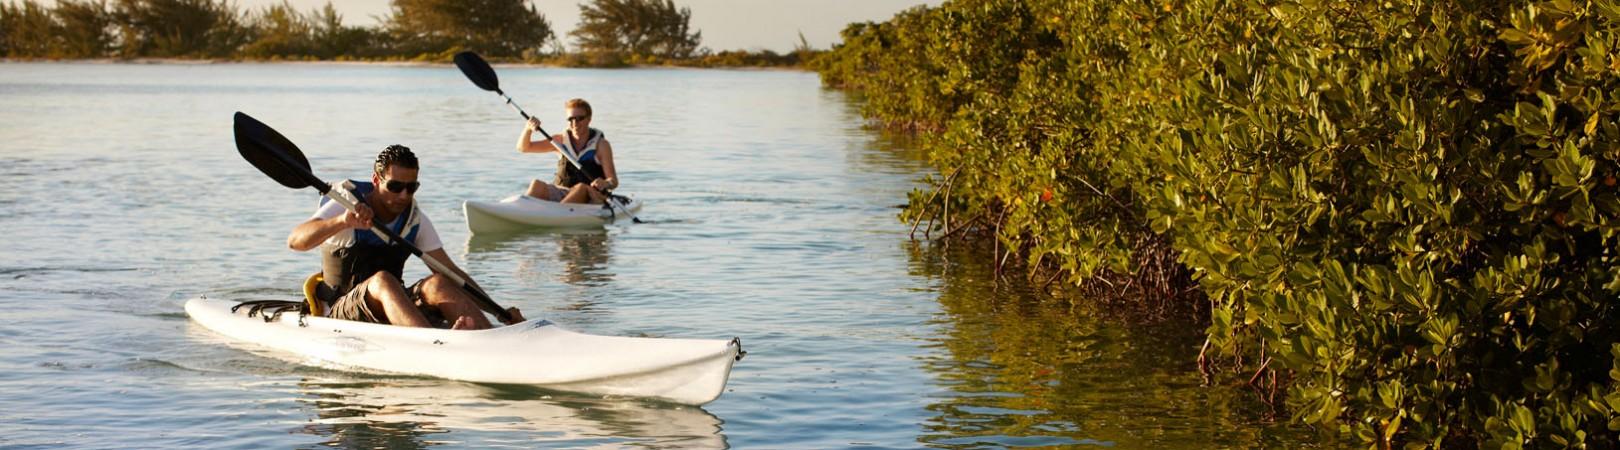 Turks-and-Caicos-Kayaking